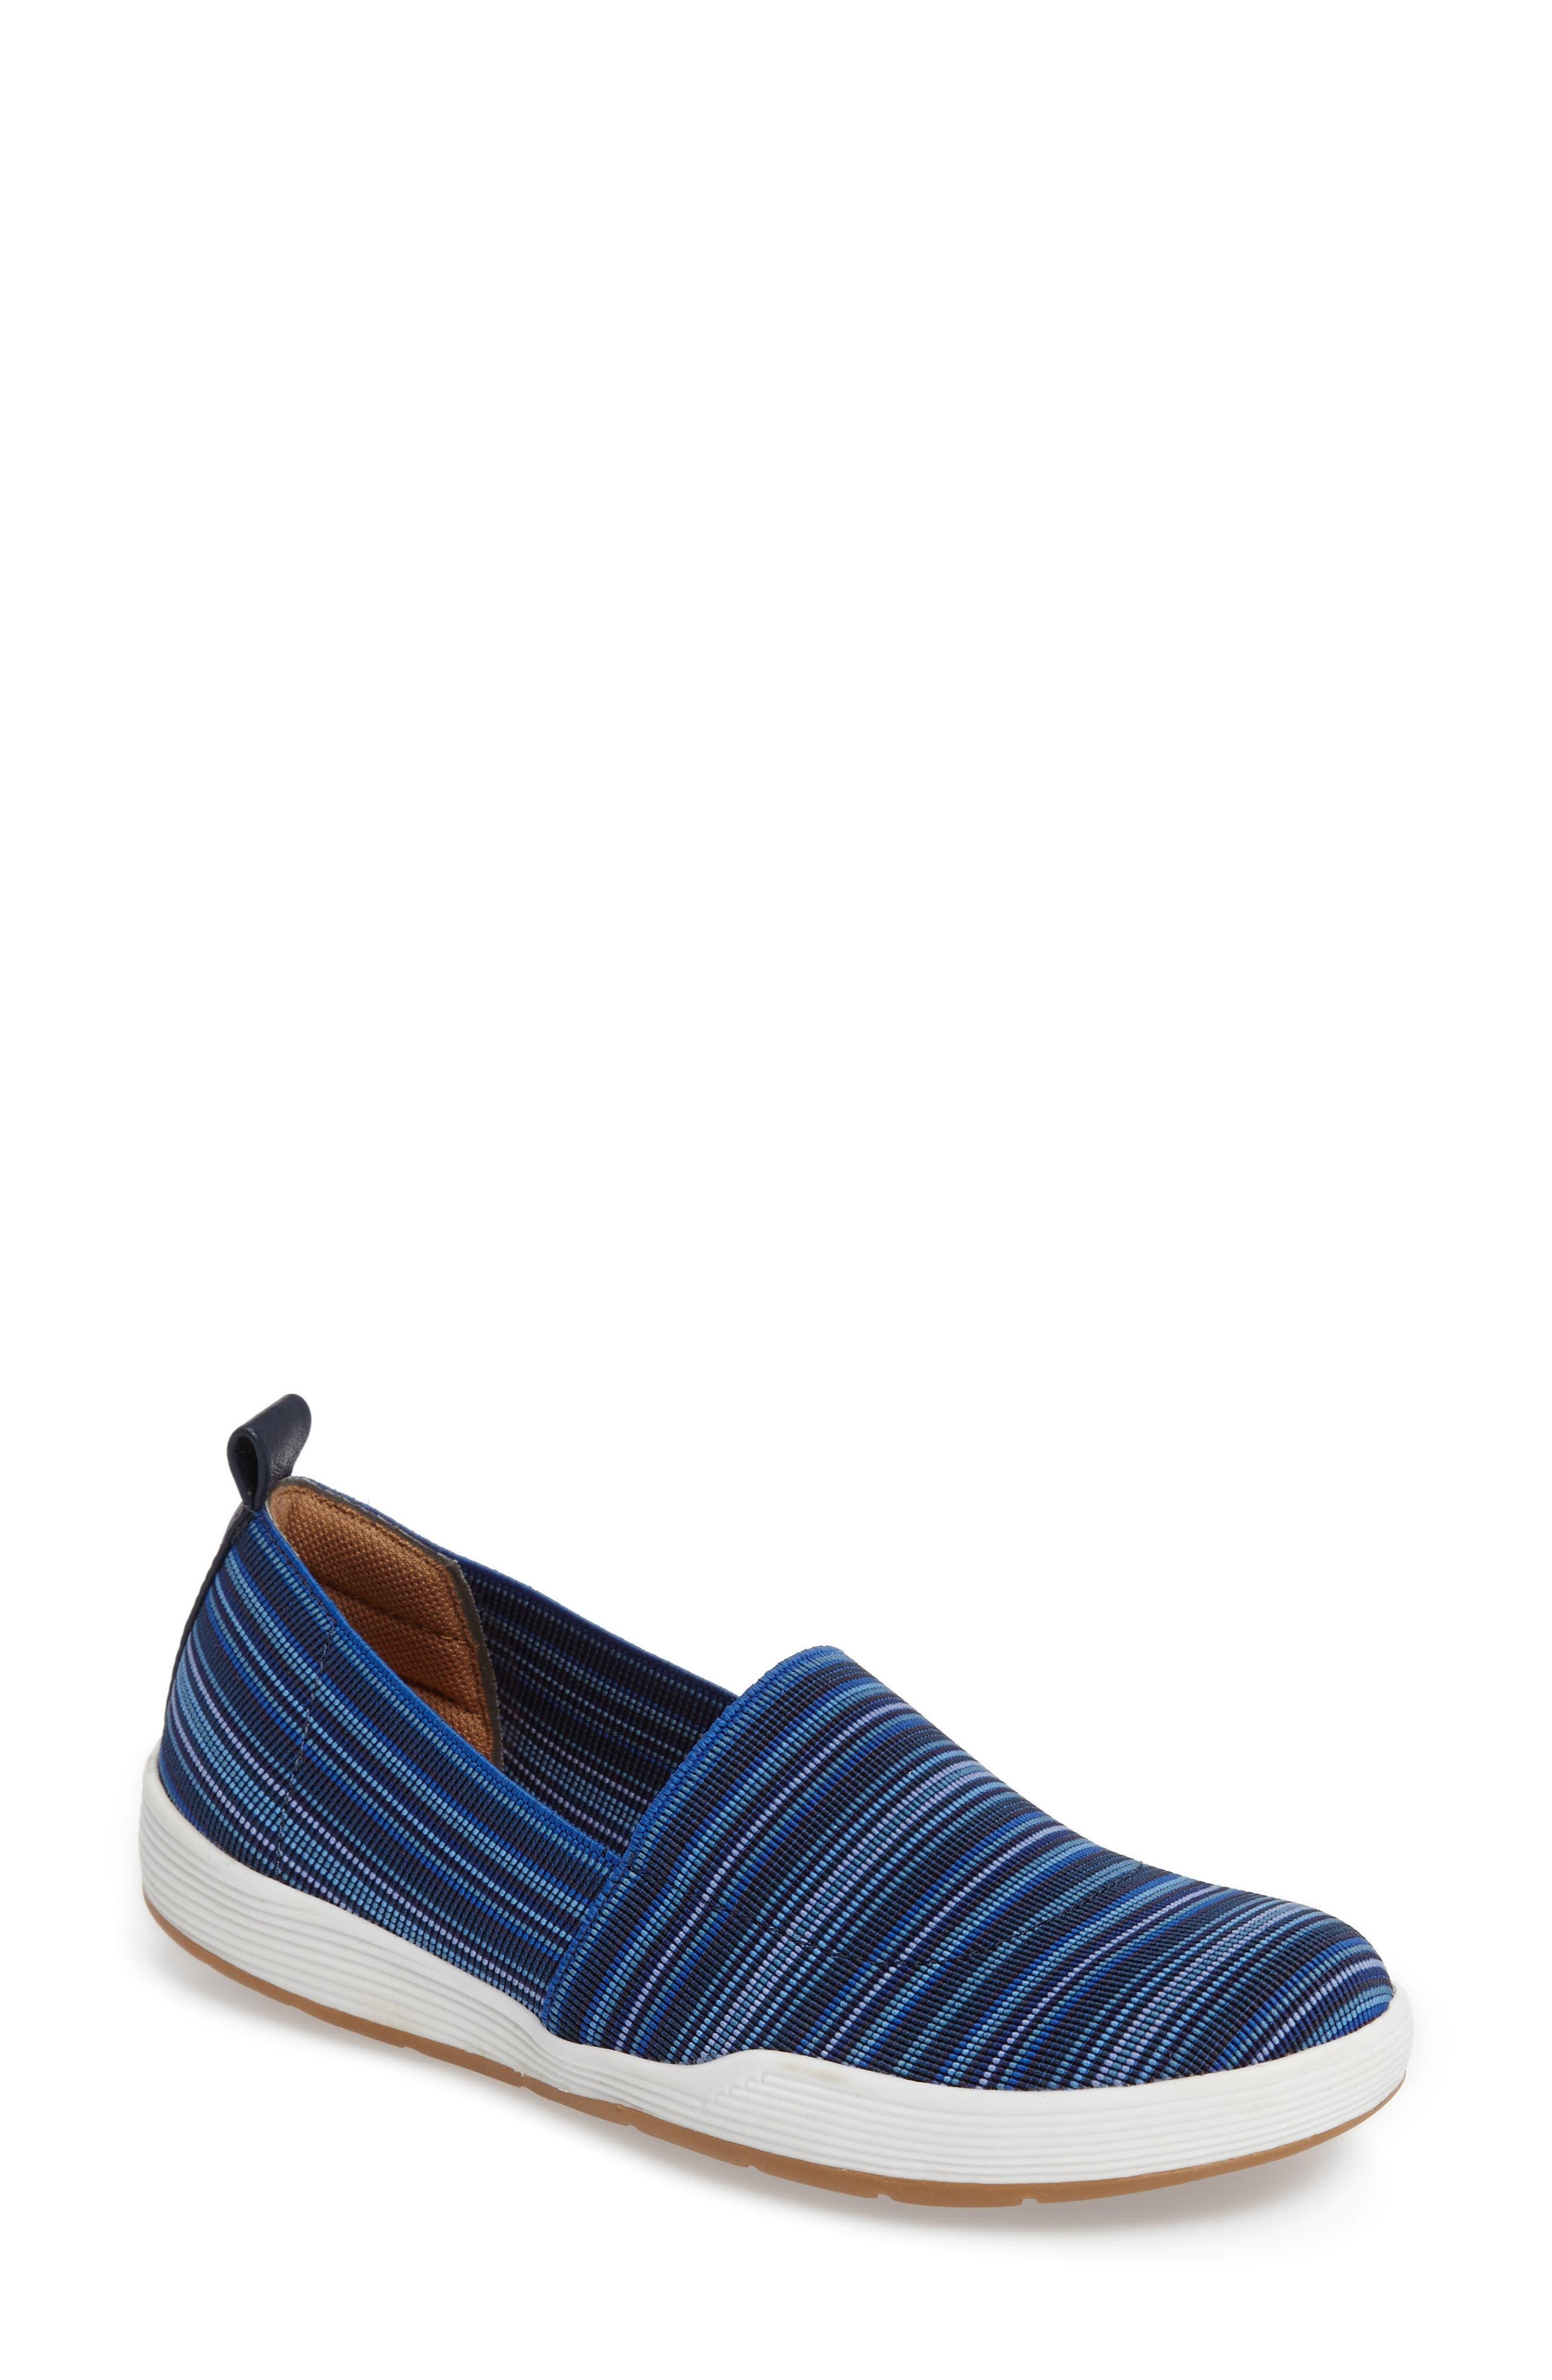 Lida Slip-On Flat,                             Main thumbnail 1, color,                             Blue Fabric